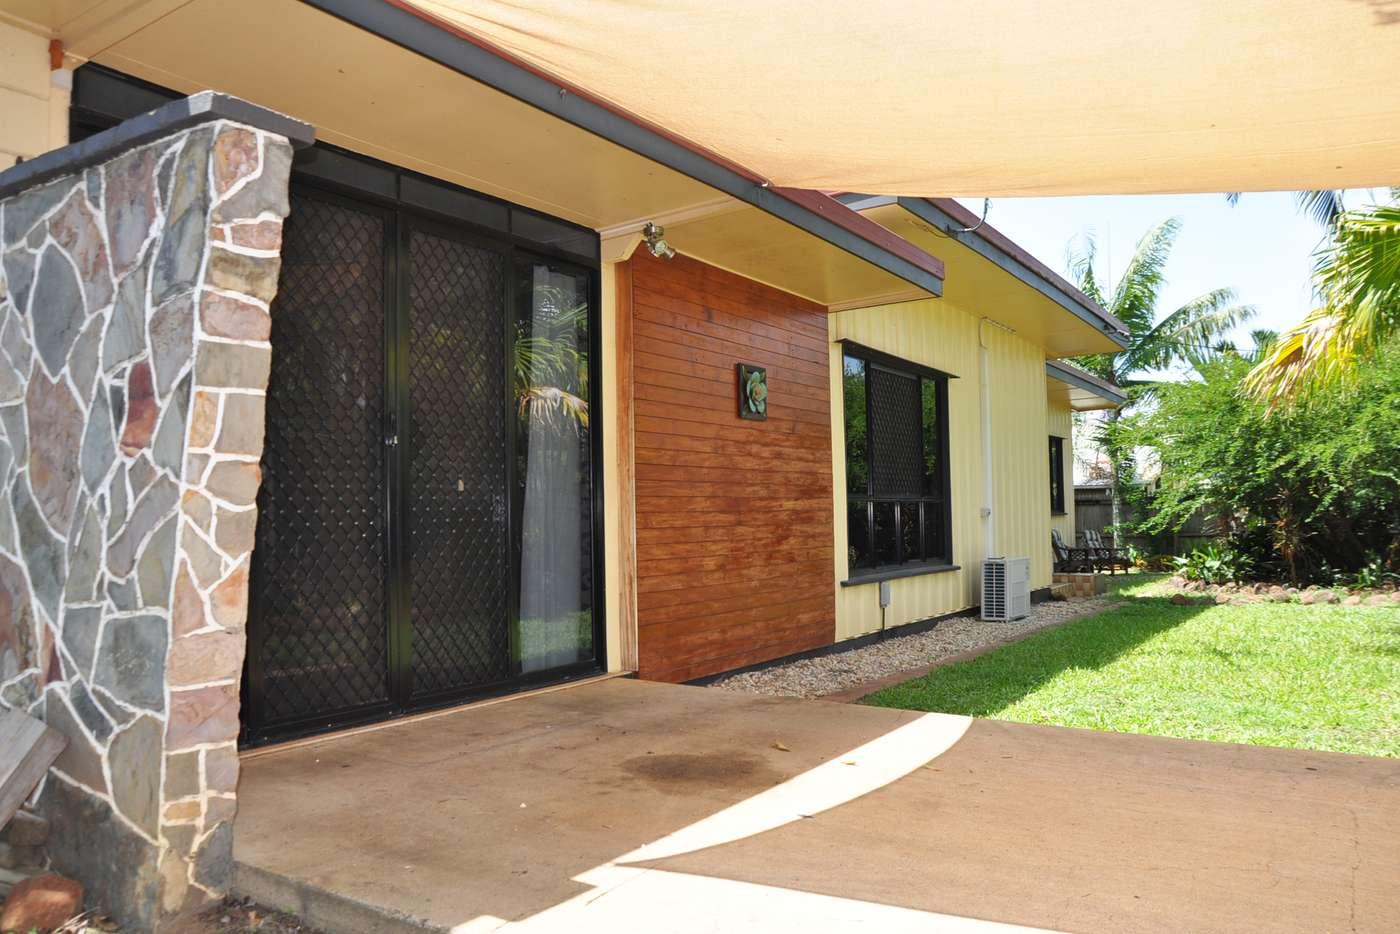 Main view of Homely house listing, 8 Meehan Street, Mareeba QLD 4880